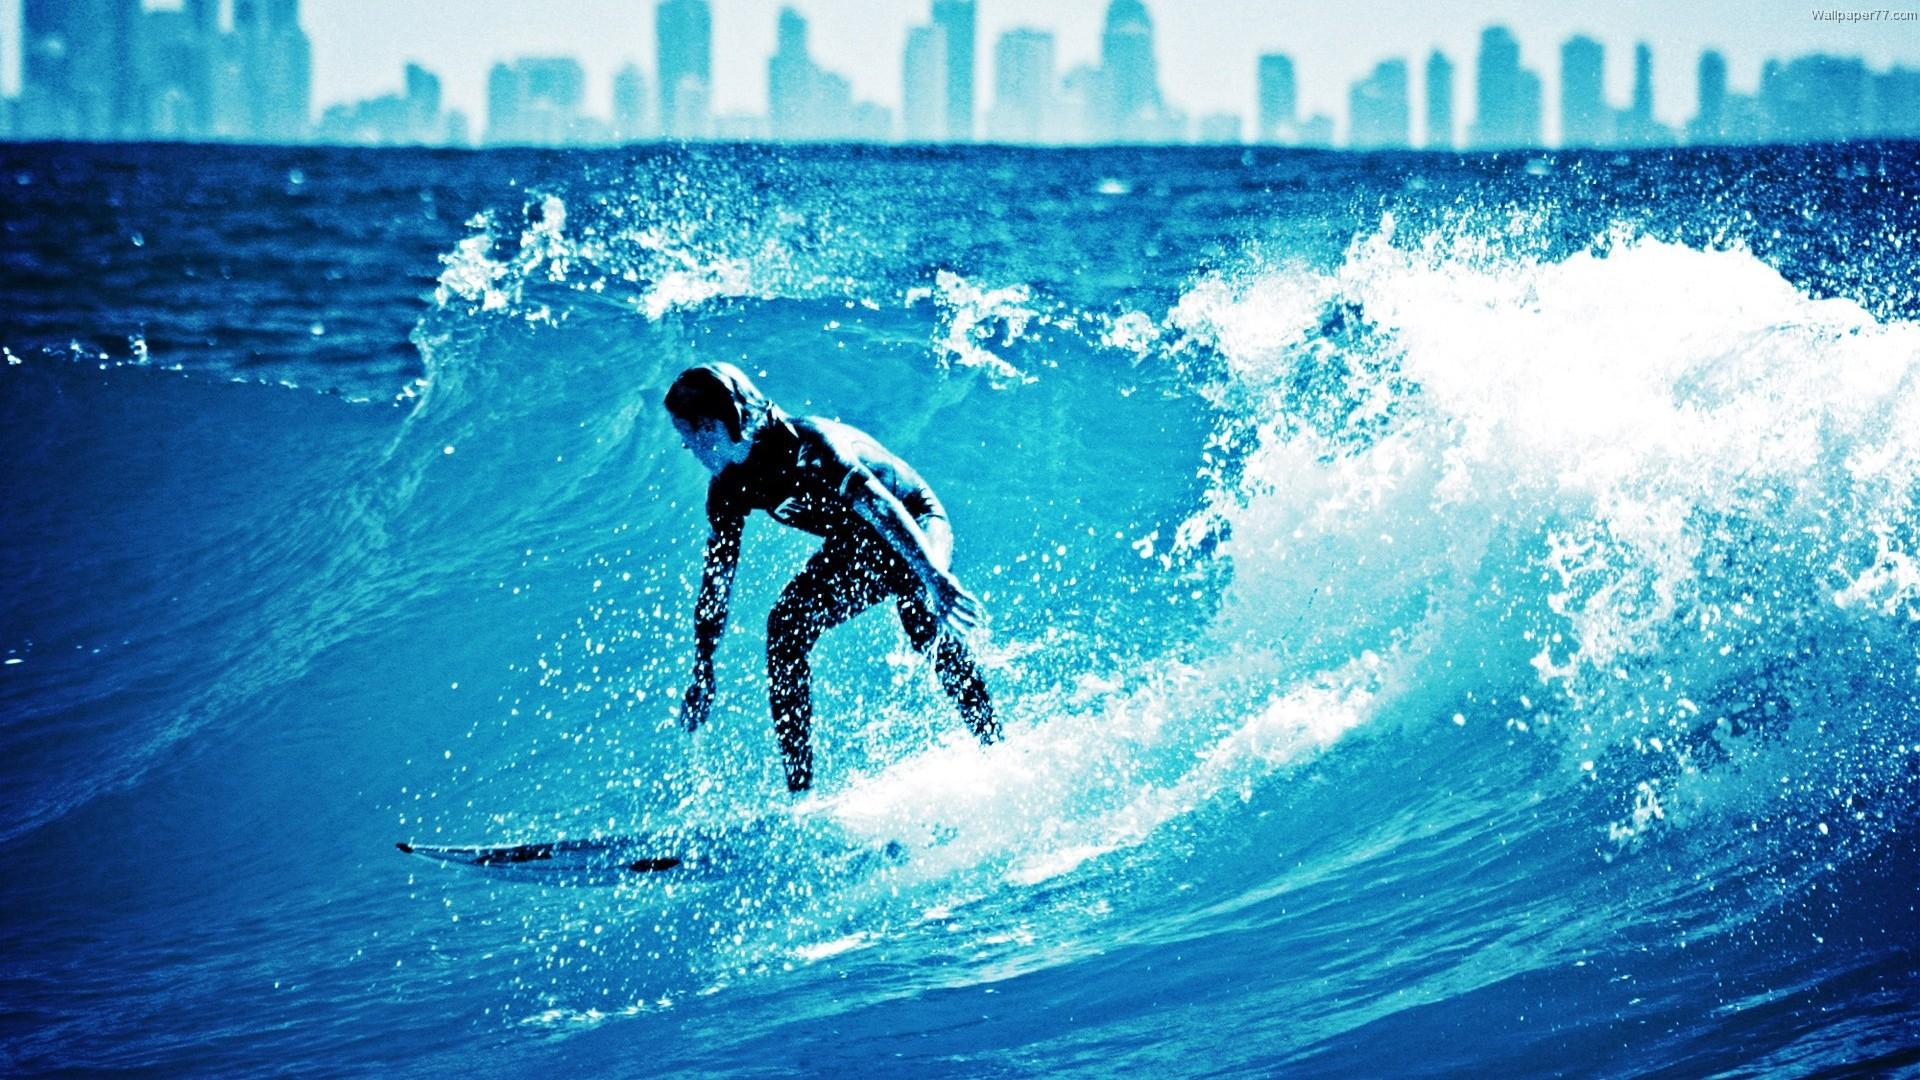 Free Download Surf Beach Background.